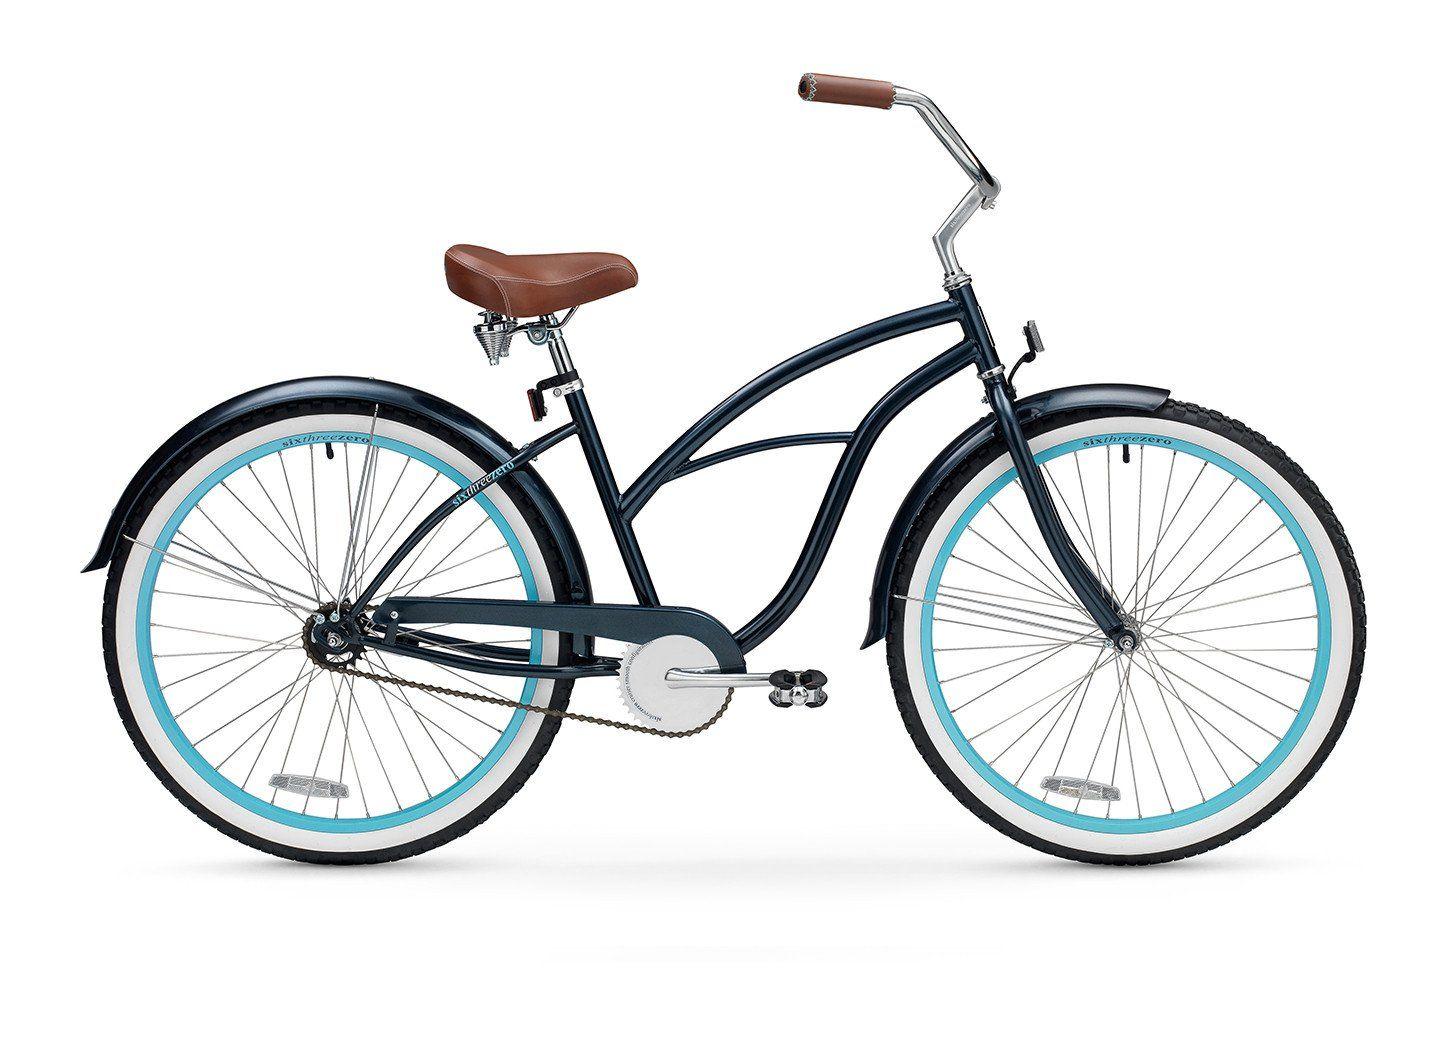 Classic Edition Single Speed Women S Beach Cruiser Bike With Images Bike Cruiser Bike Beach Cruiser Bike